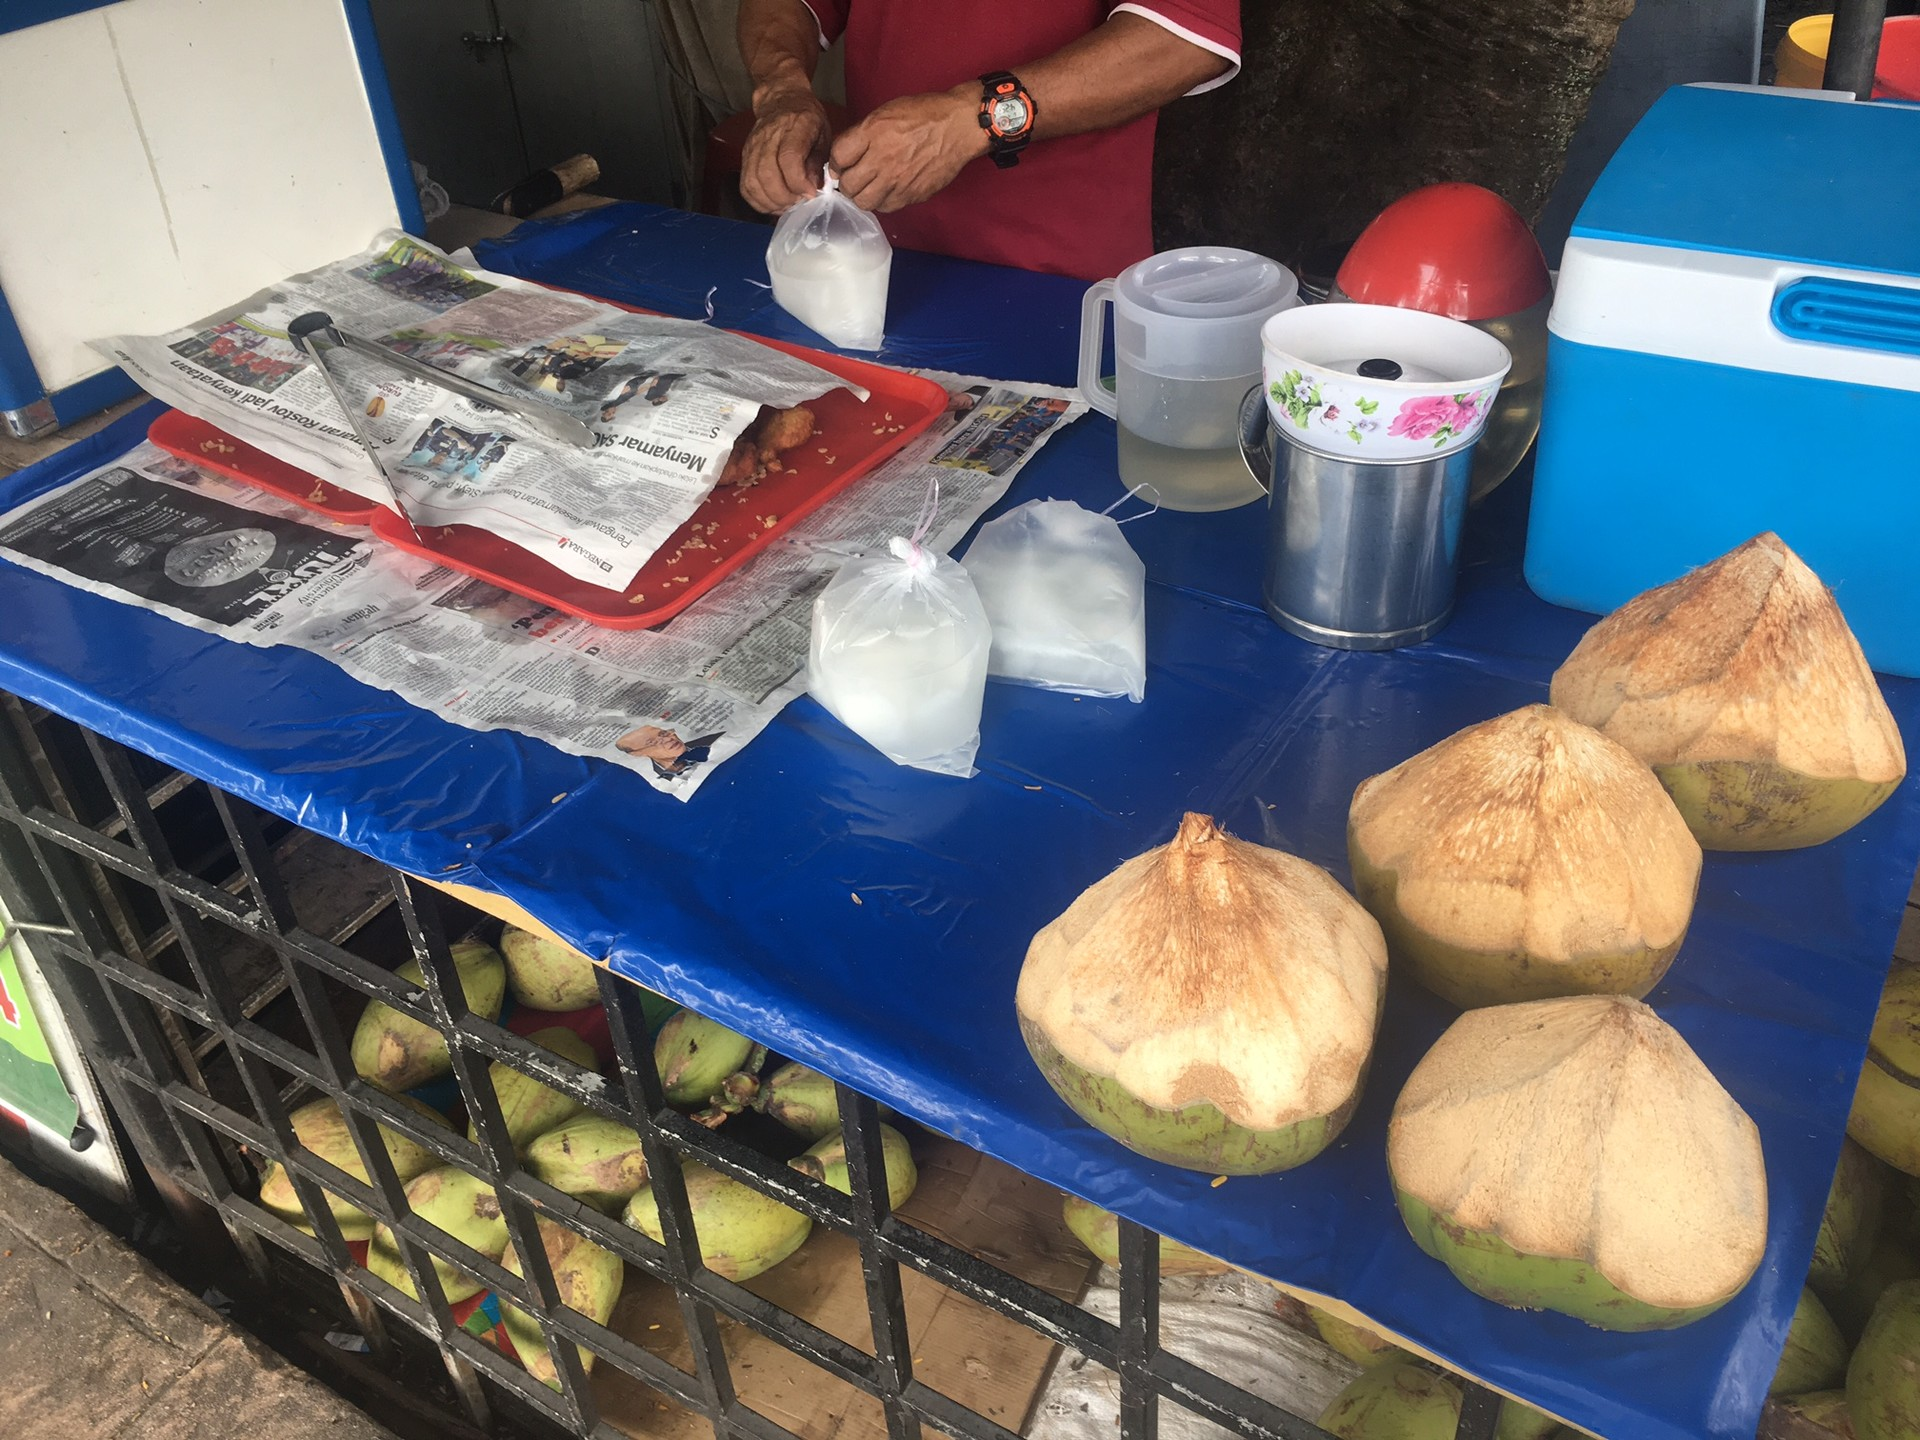 Cocos al estilo de Kuala Lumpur